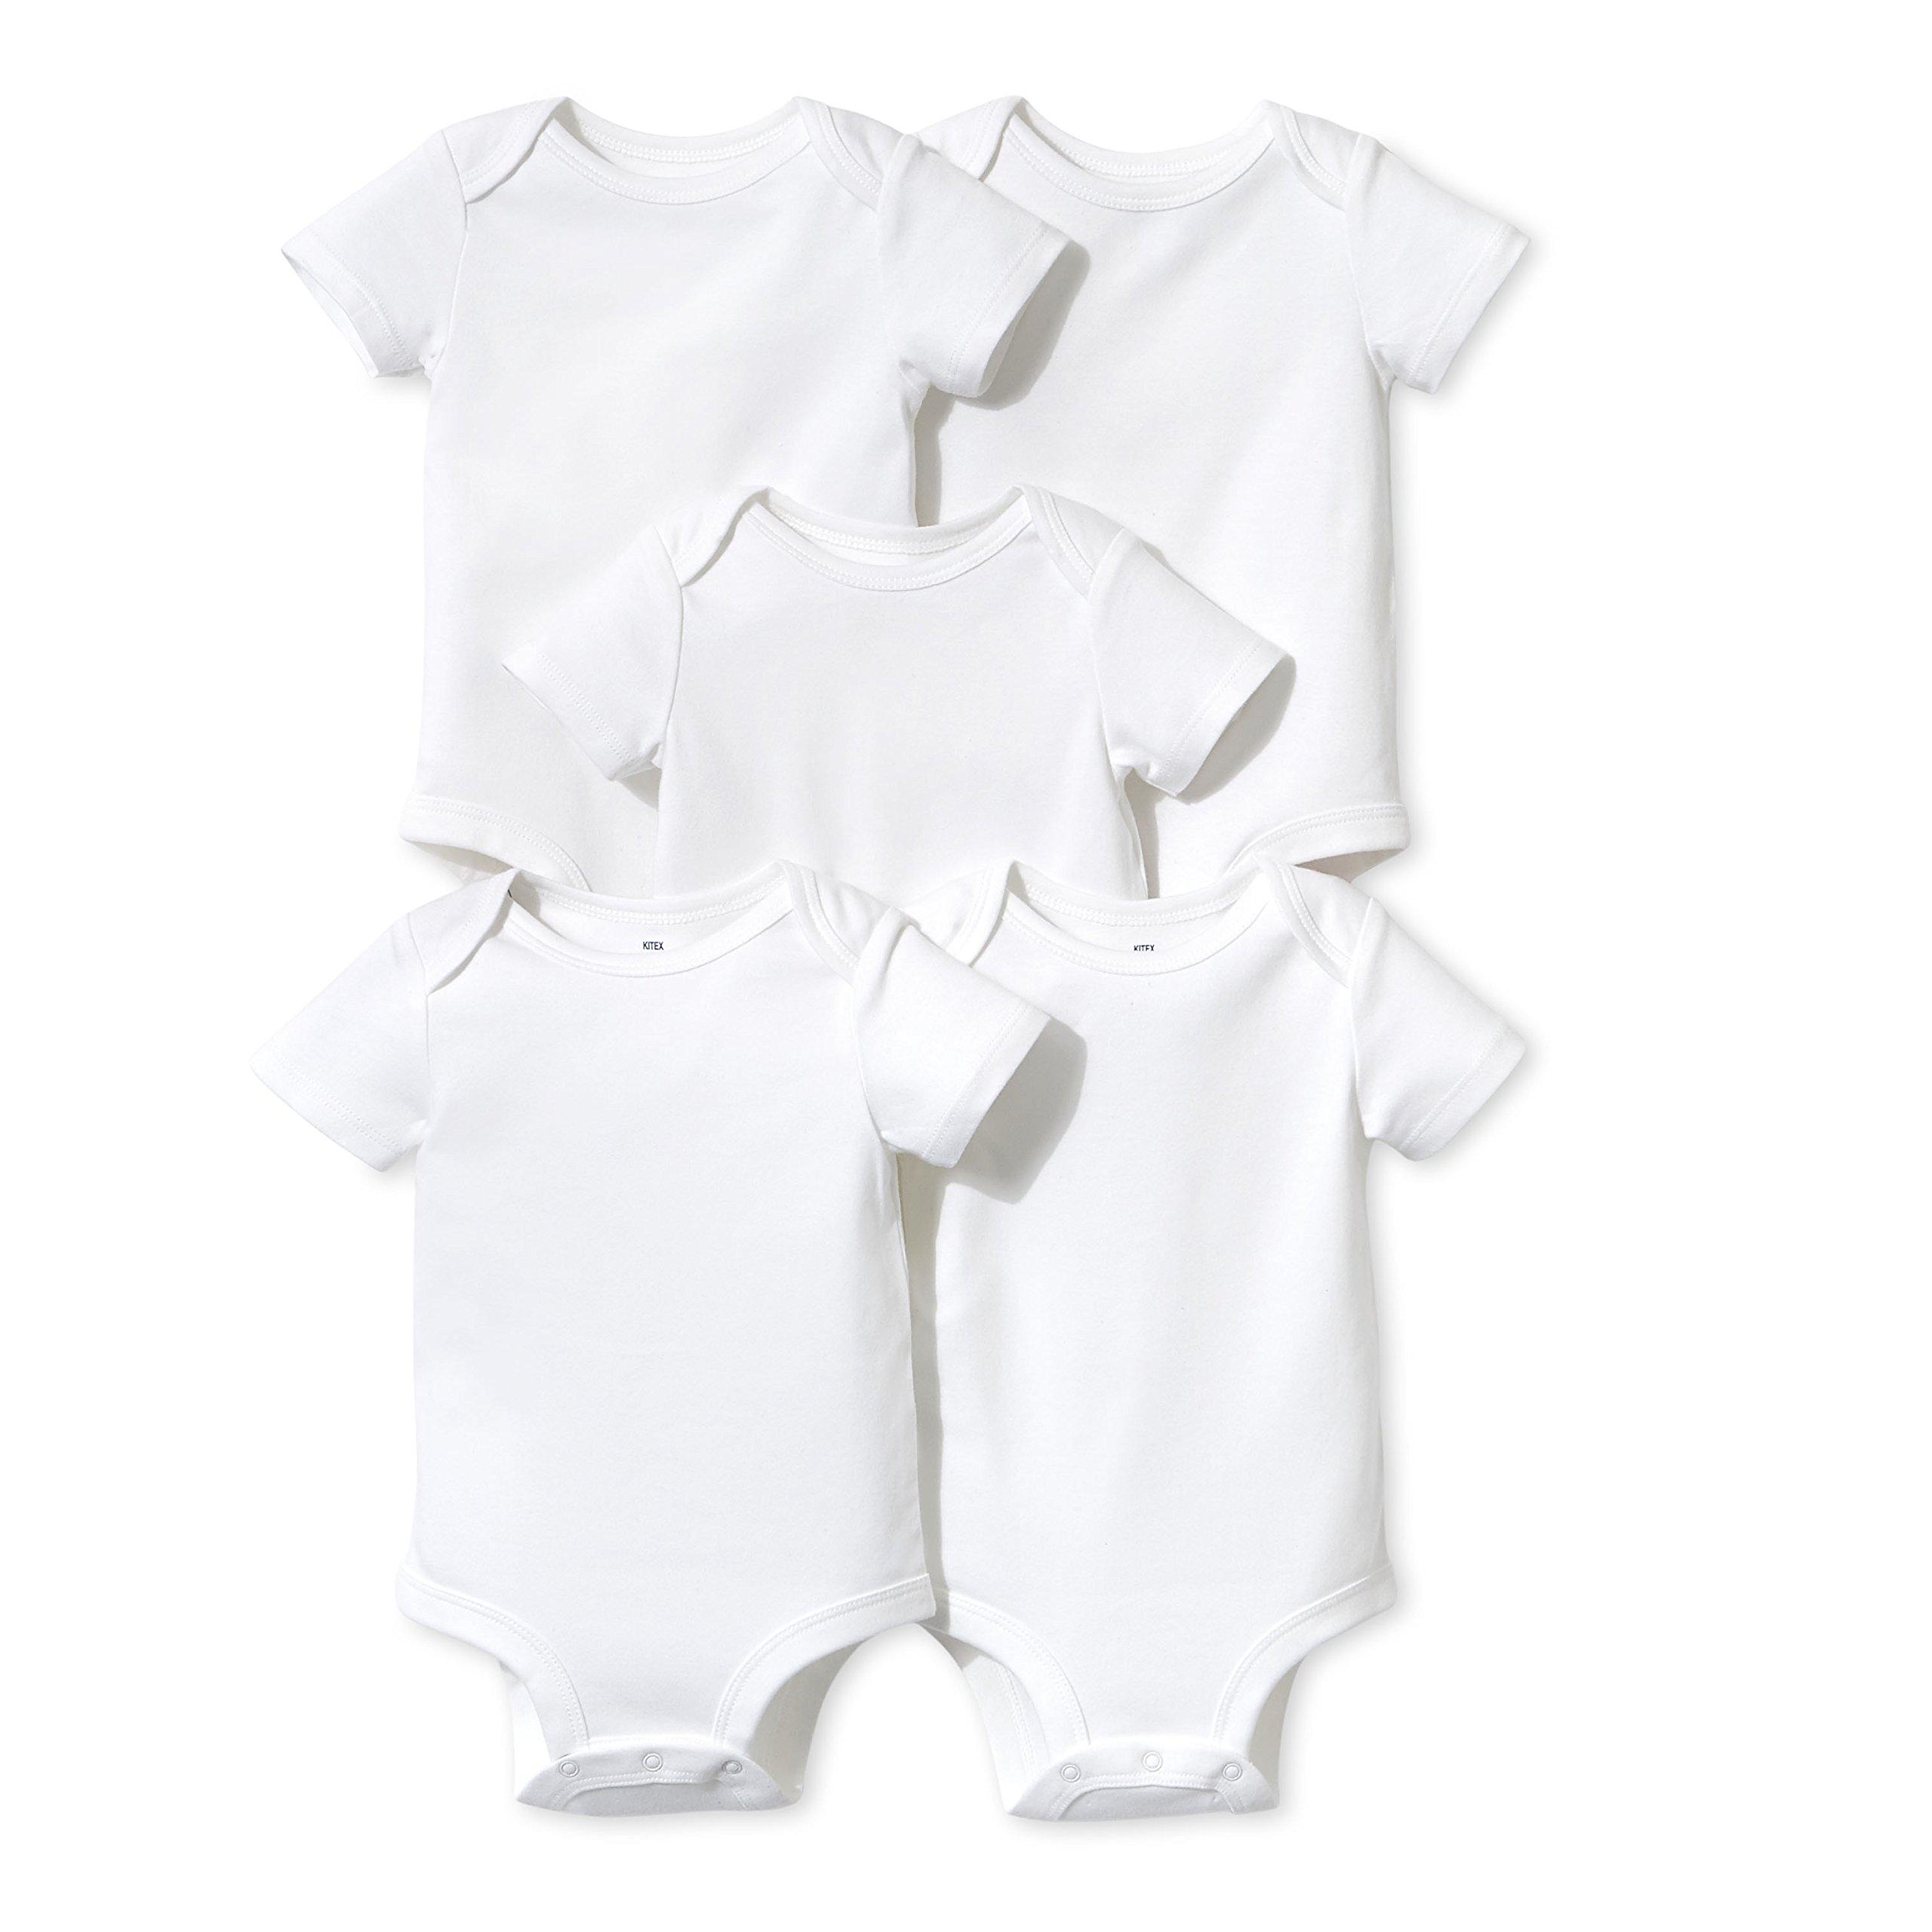 Lamaze Baby Organic Essentials 5 Pack Shortsleeve Bodysuits, White, 3M